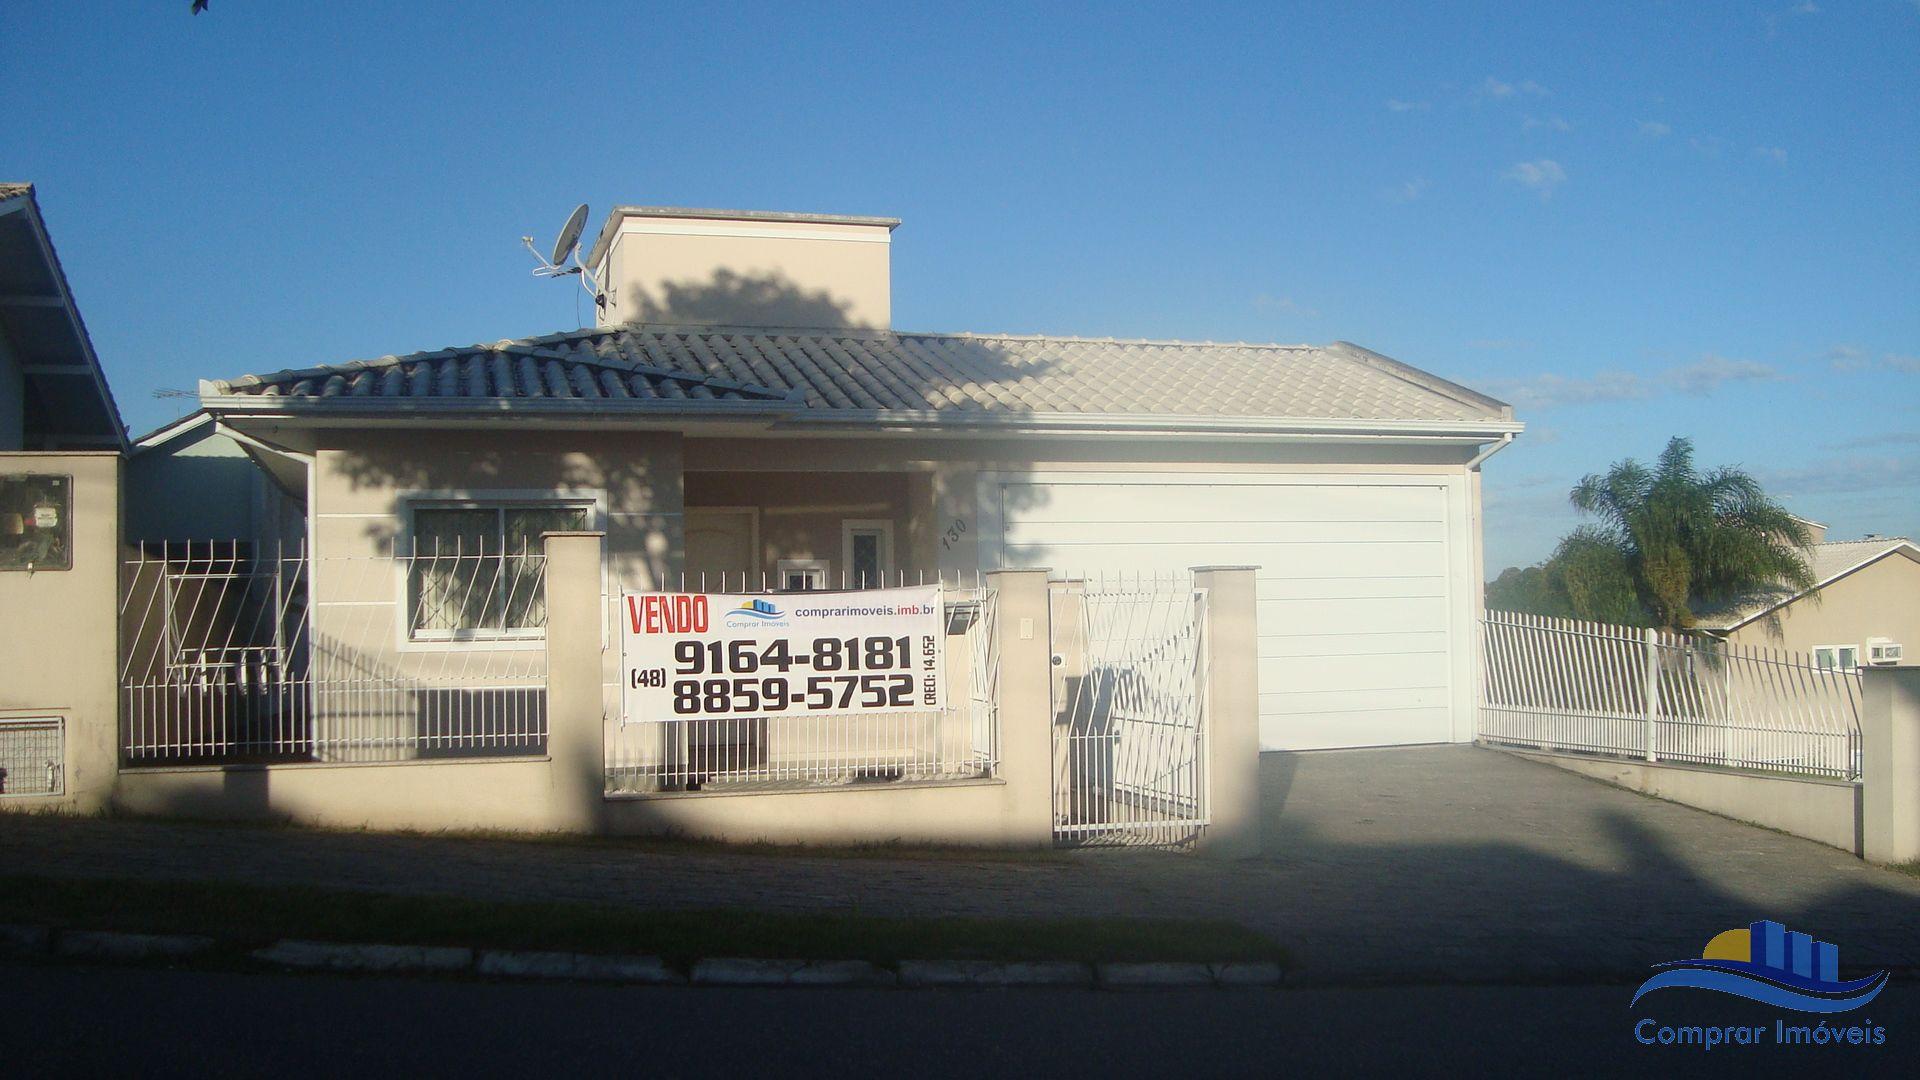 Imóvel: Comprar Imóveis - Casa 3 Dorm, Palhoca (62)